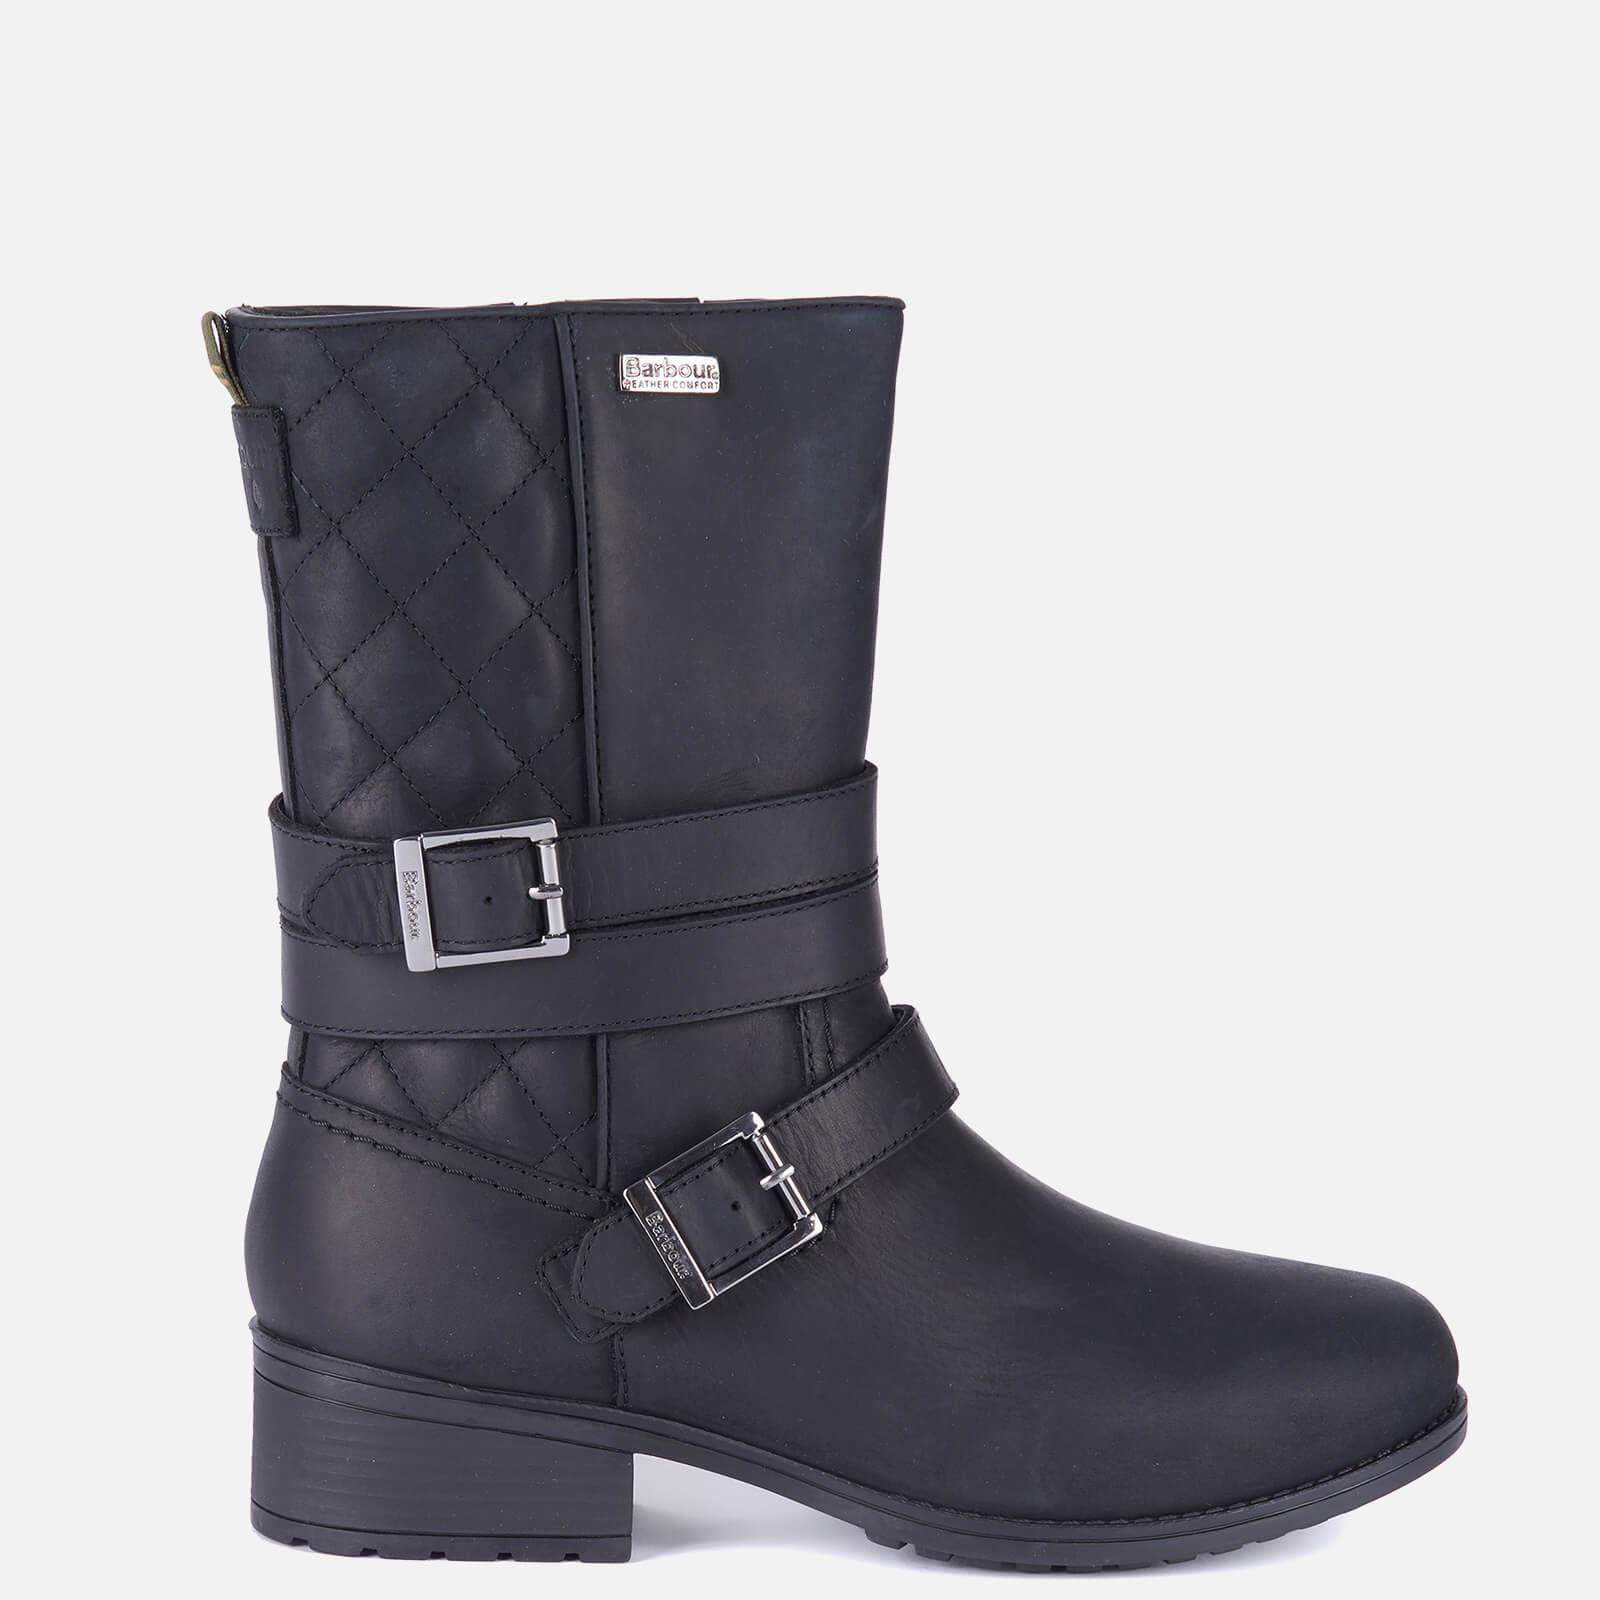 Barbour Women's Garda Ankle Boots - Black - Uk 4